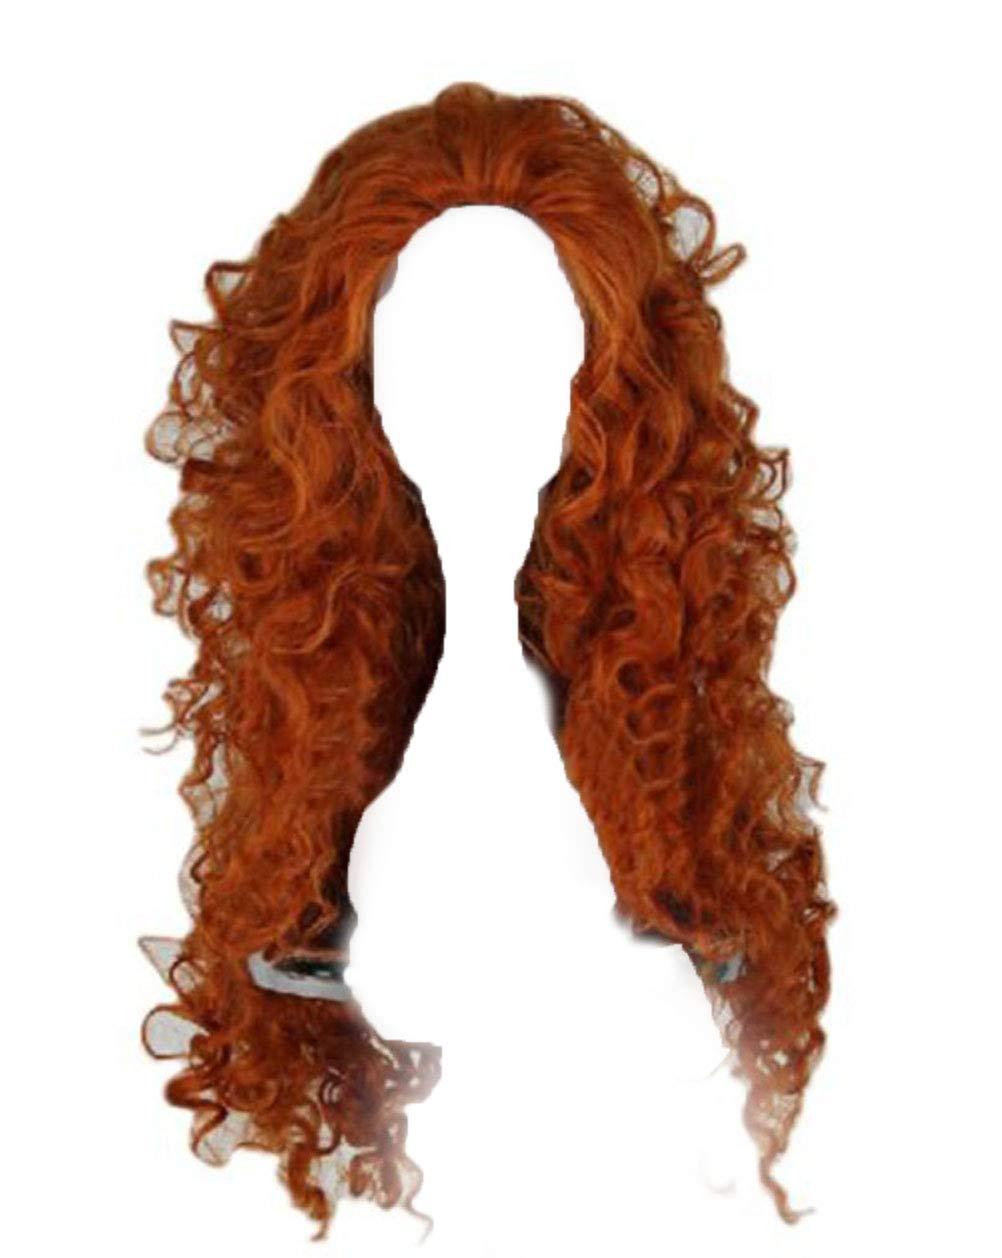 Xcoser Long Curly Princess Merida Cosplay Wig for Cosplay